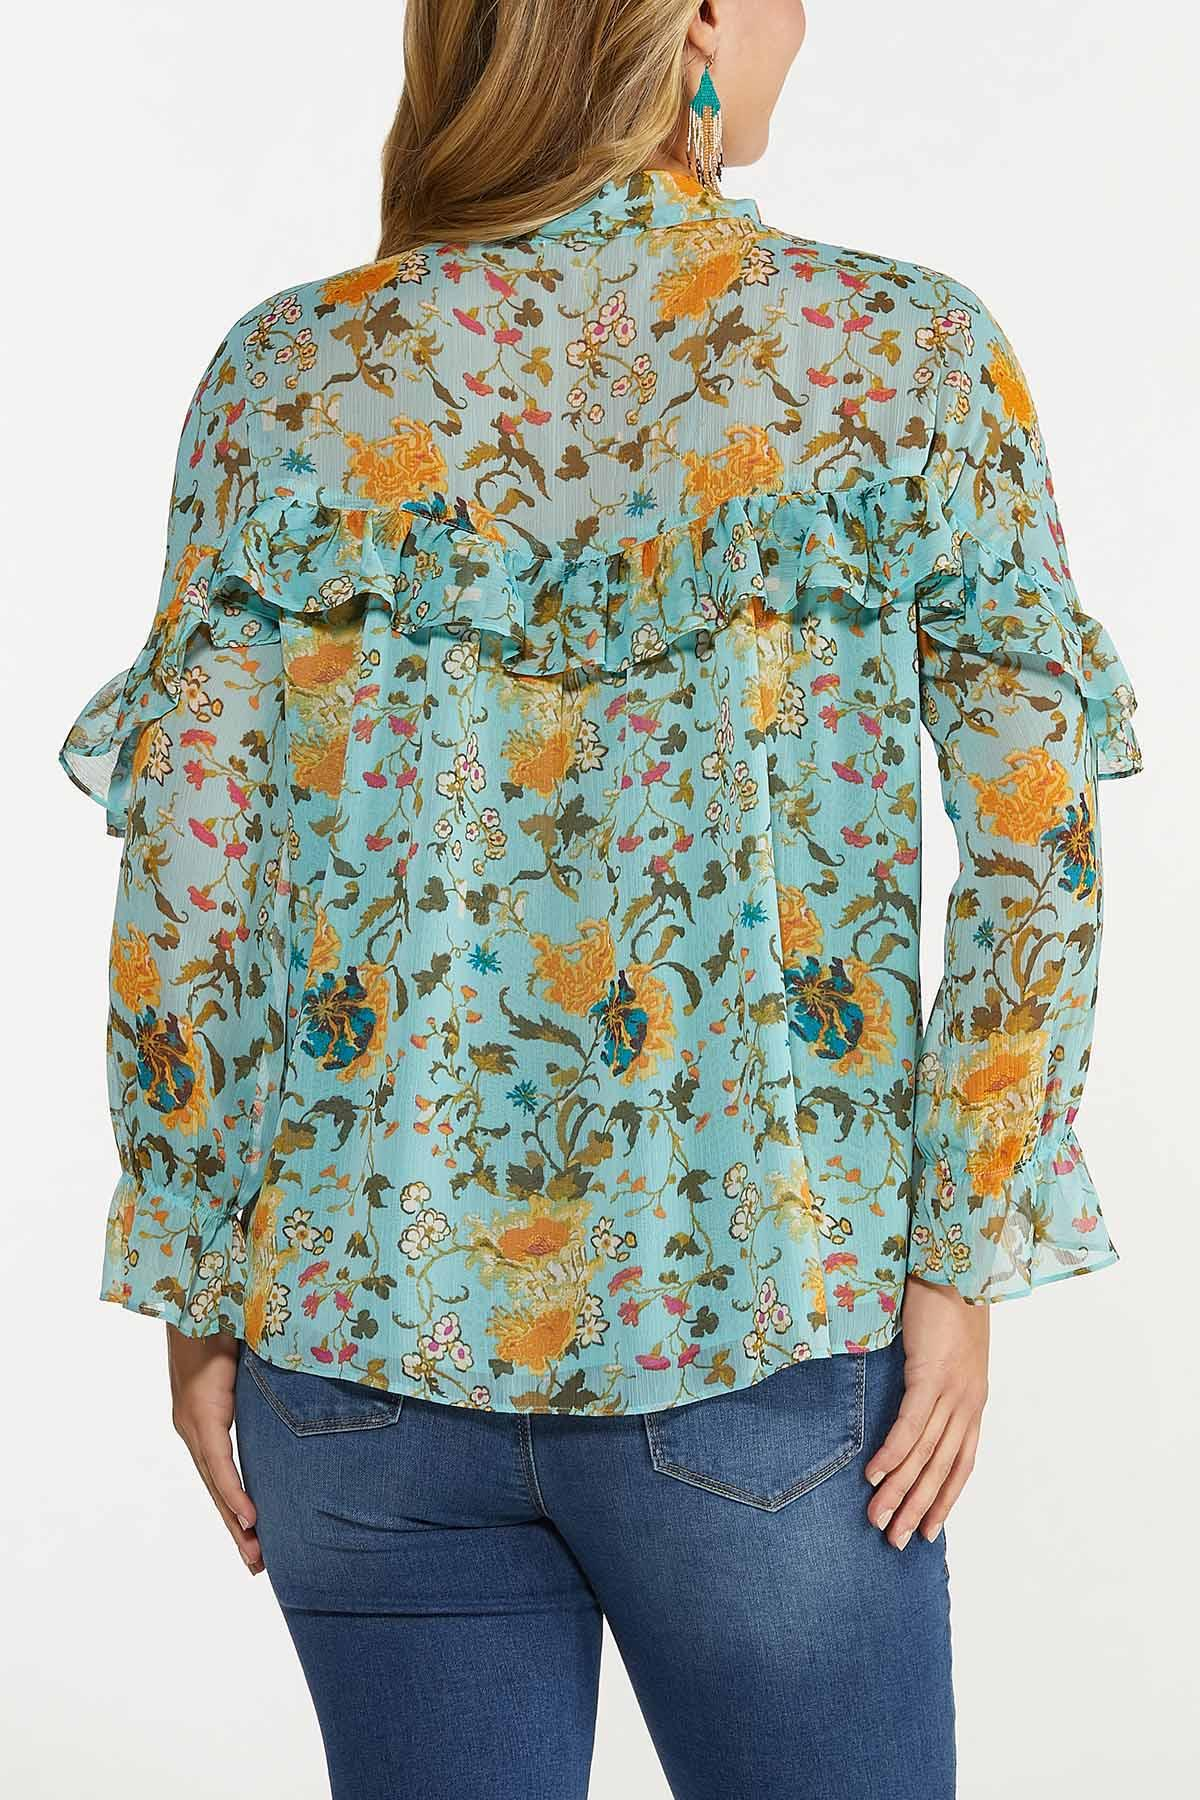 Ruffled Teal Floral Top (Item #44653570)